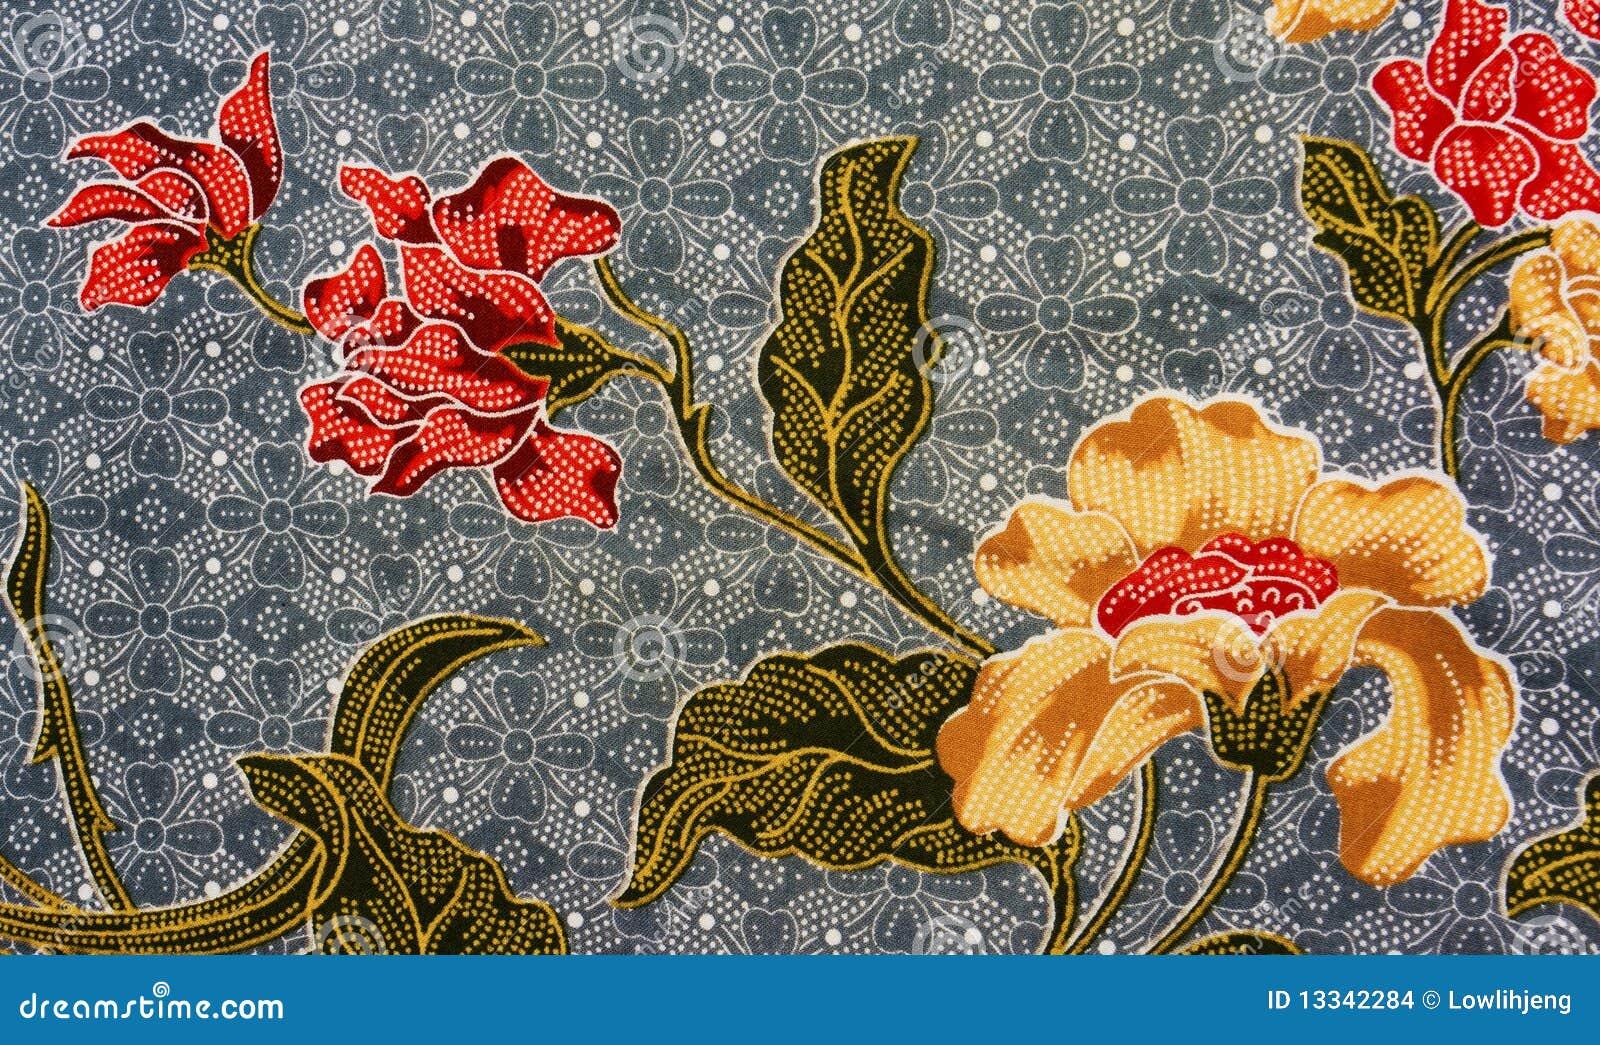 Batik Pattern, Malaysia Stock Images - Image: 13342284